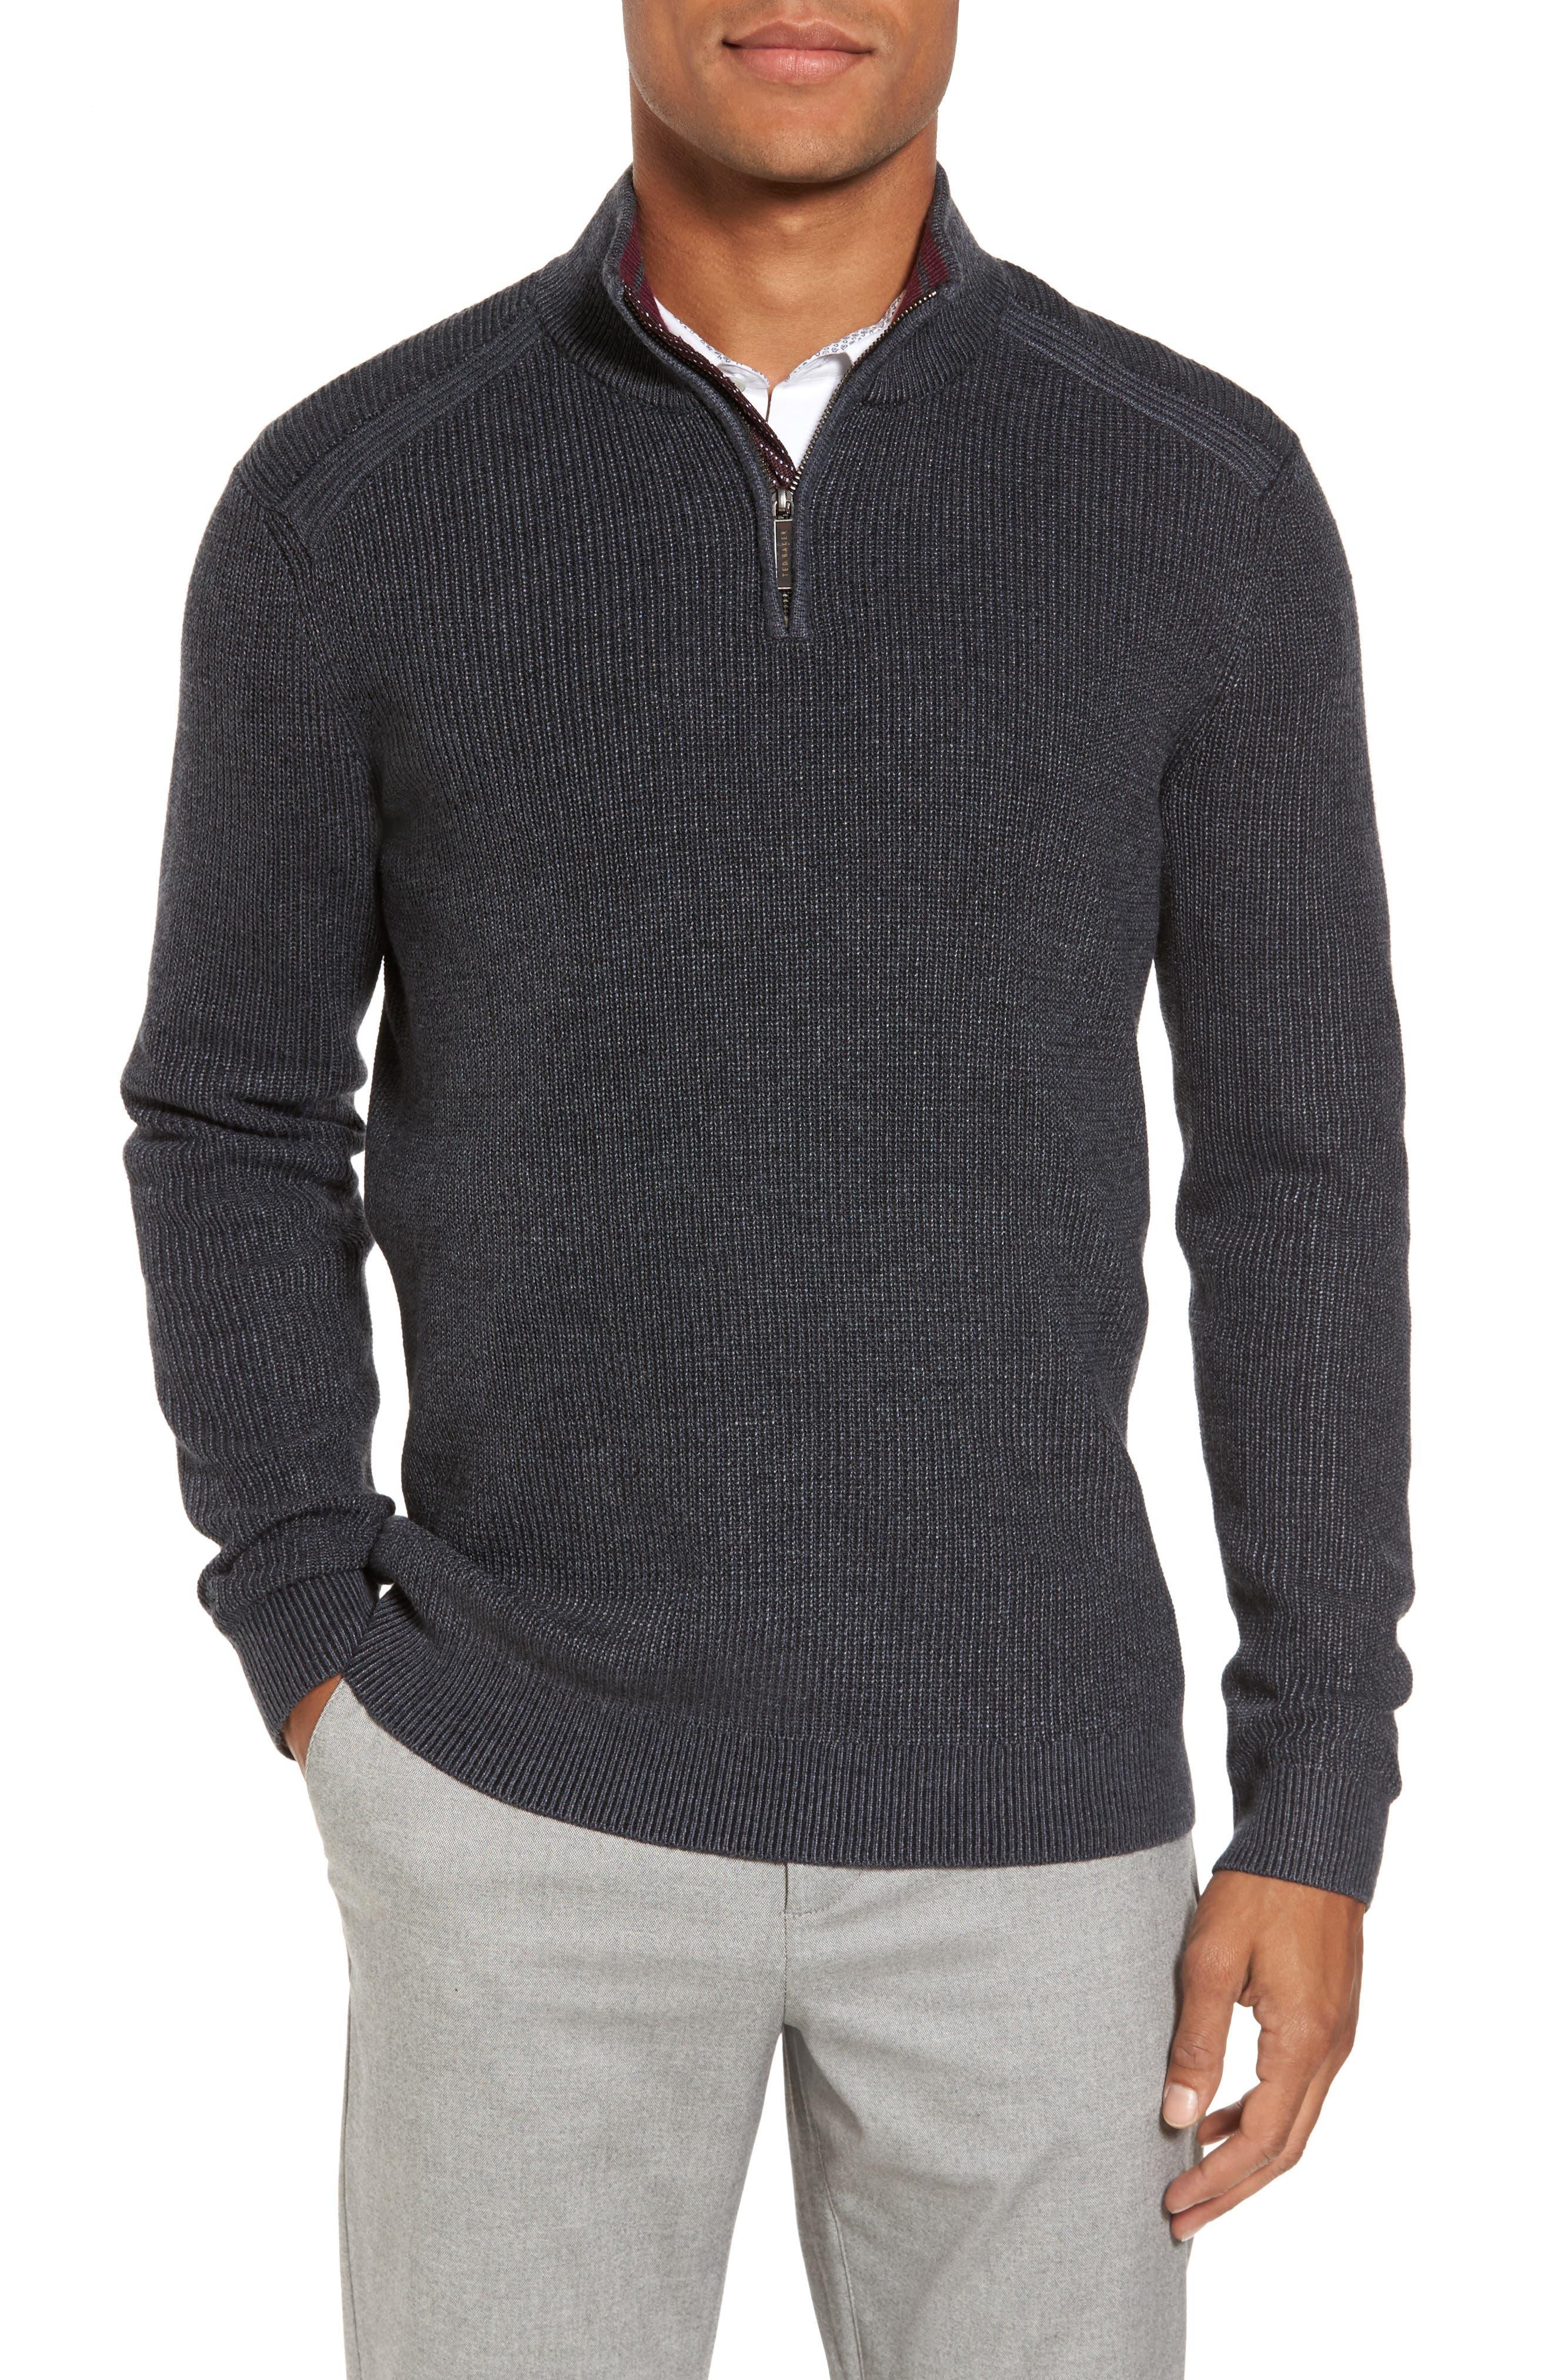 Main Image - Ted Baker London Slim Fit Quarter Zip Sweater (Tall)